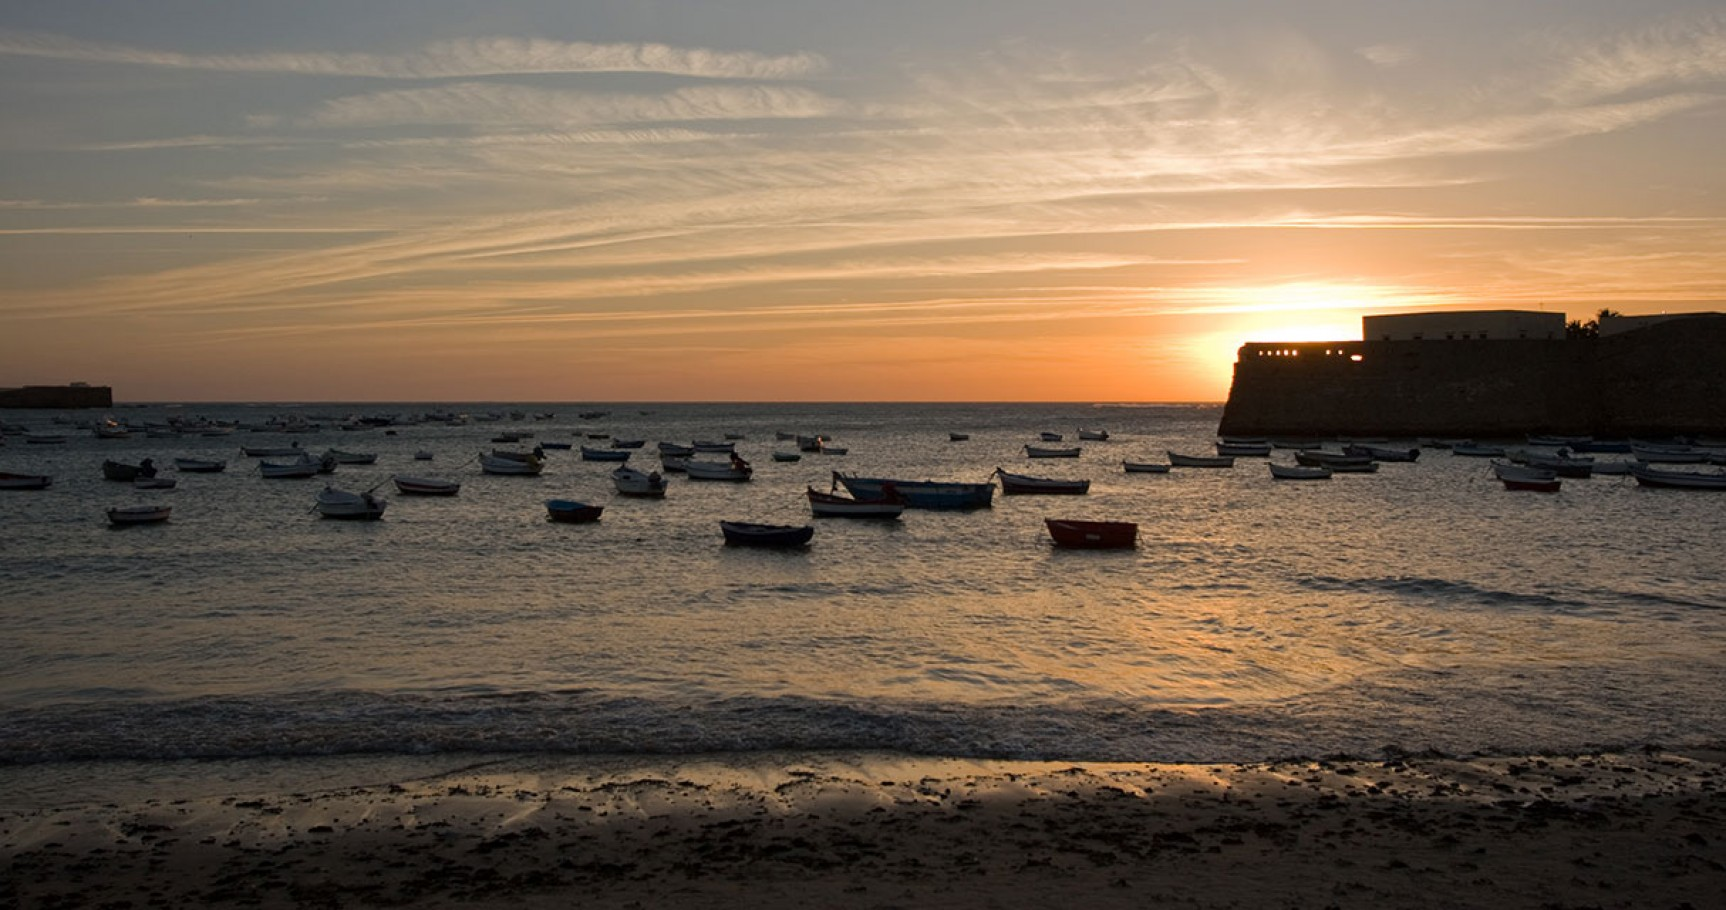 Fotografía de la Playa de la Caleta, Cádiz